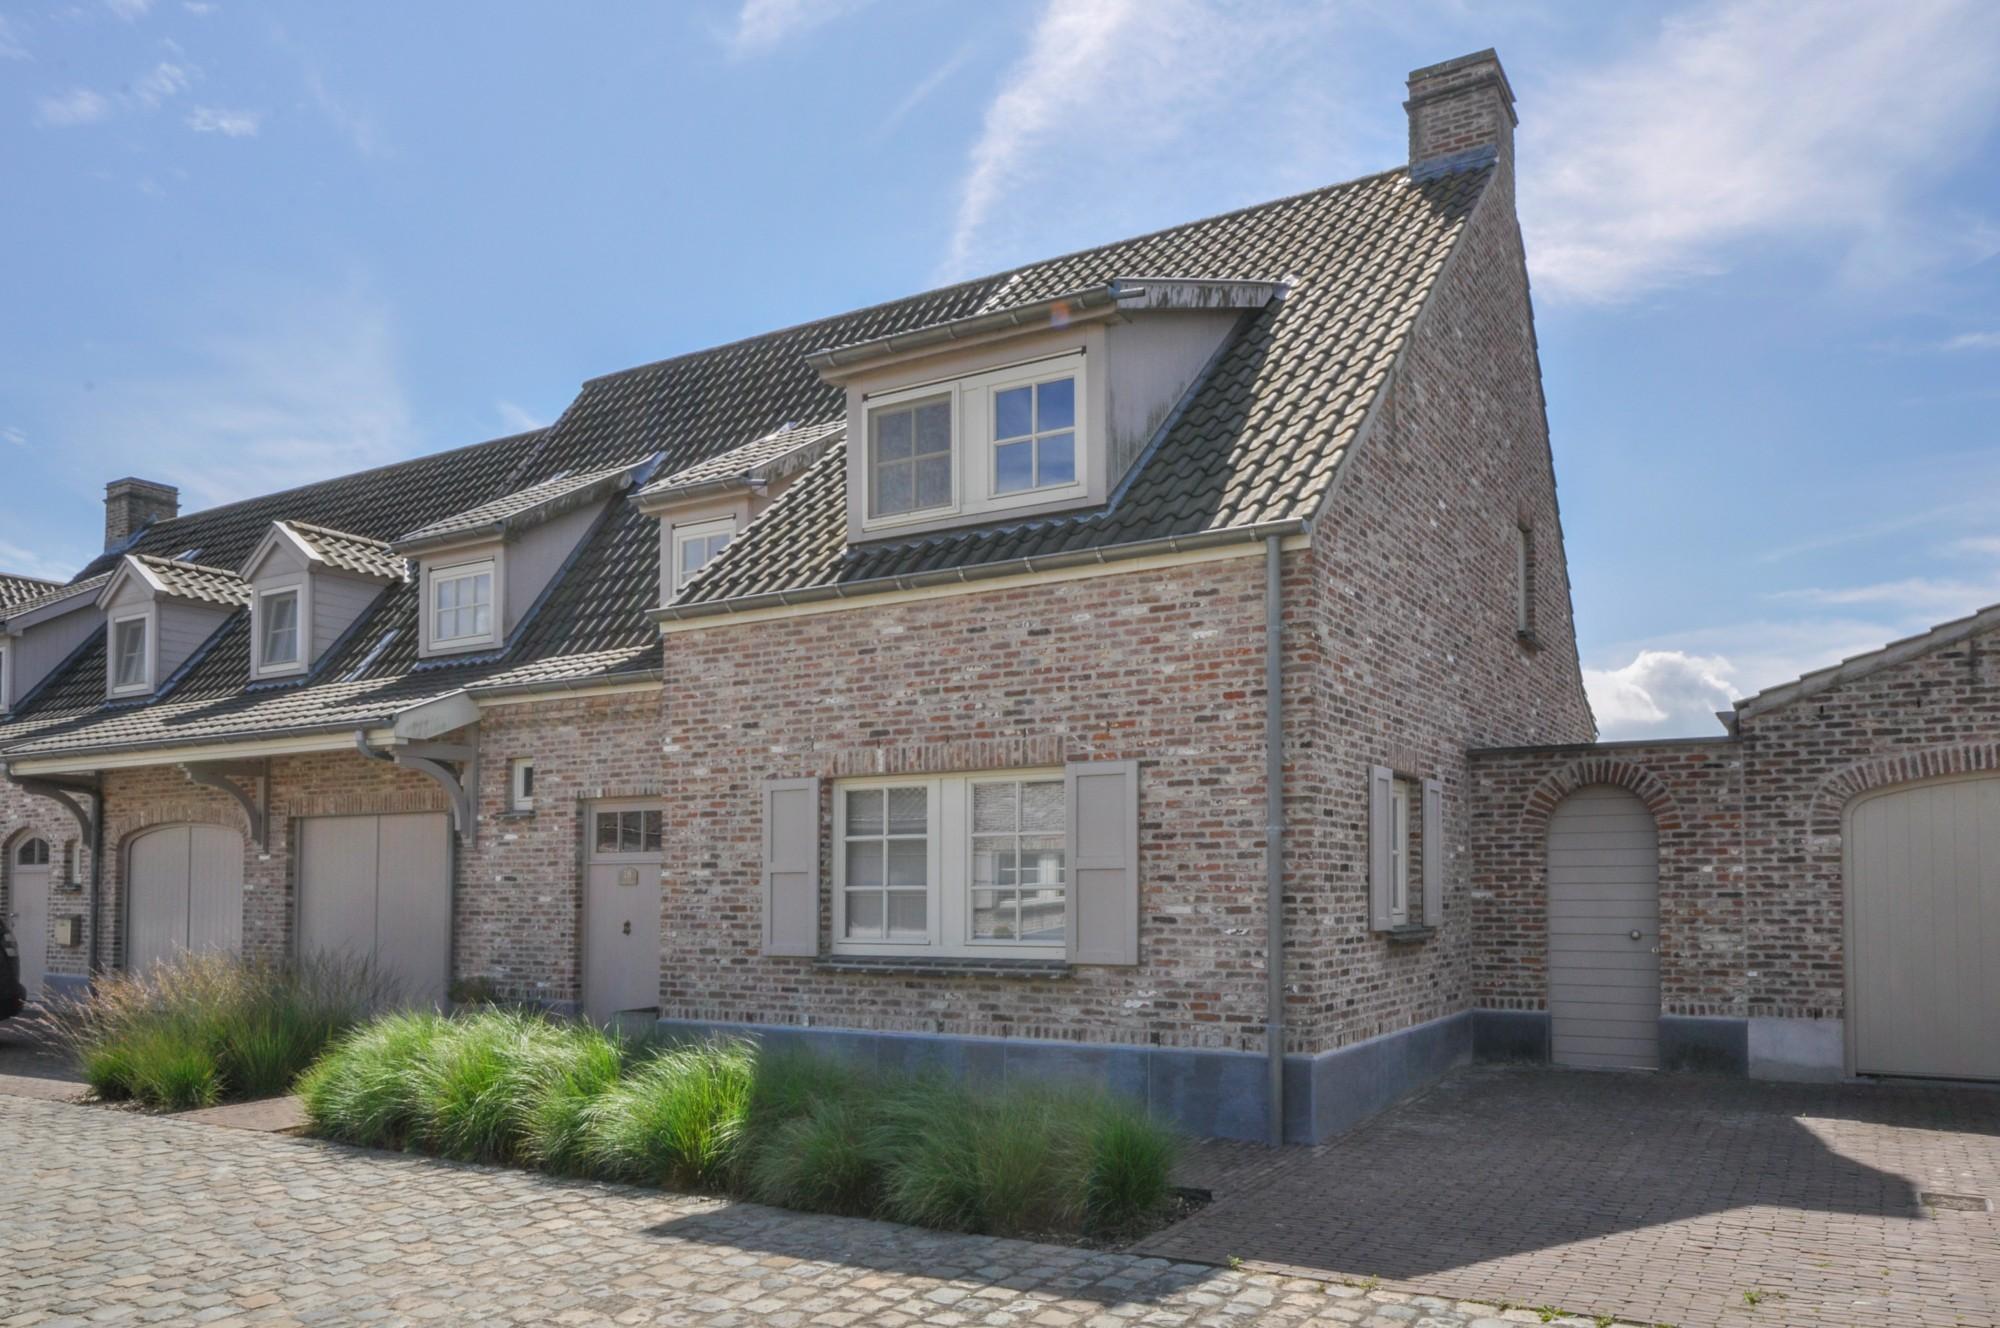 Verkoop huis t3 f3 knokke heist biezenmaat ramskapelle for Huis verkoop site